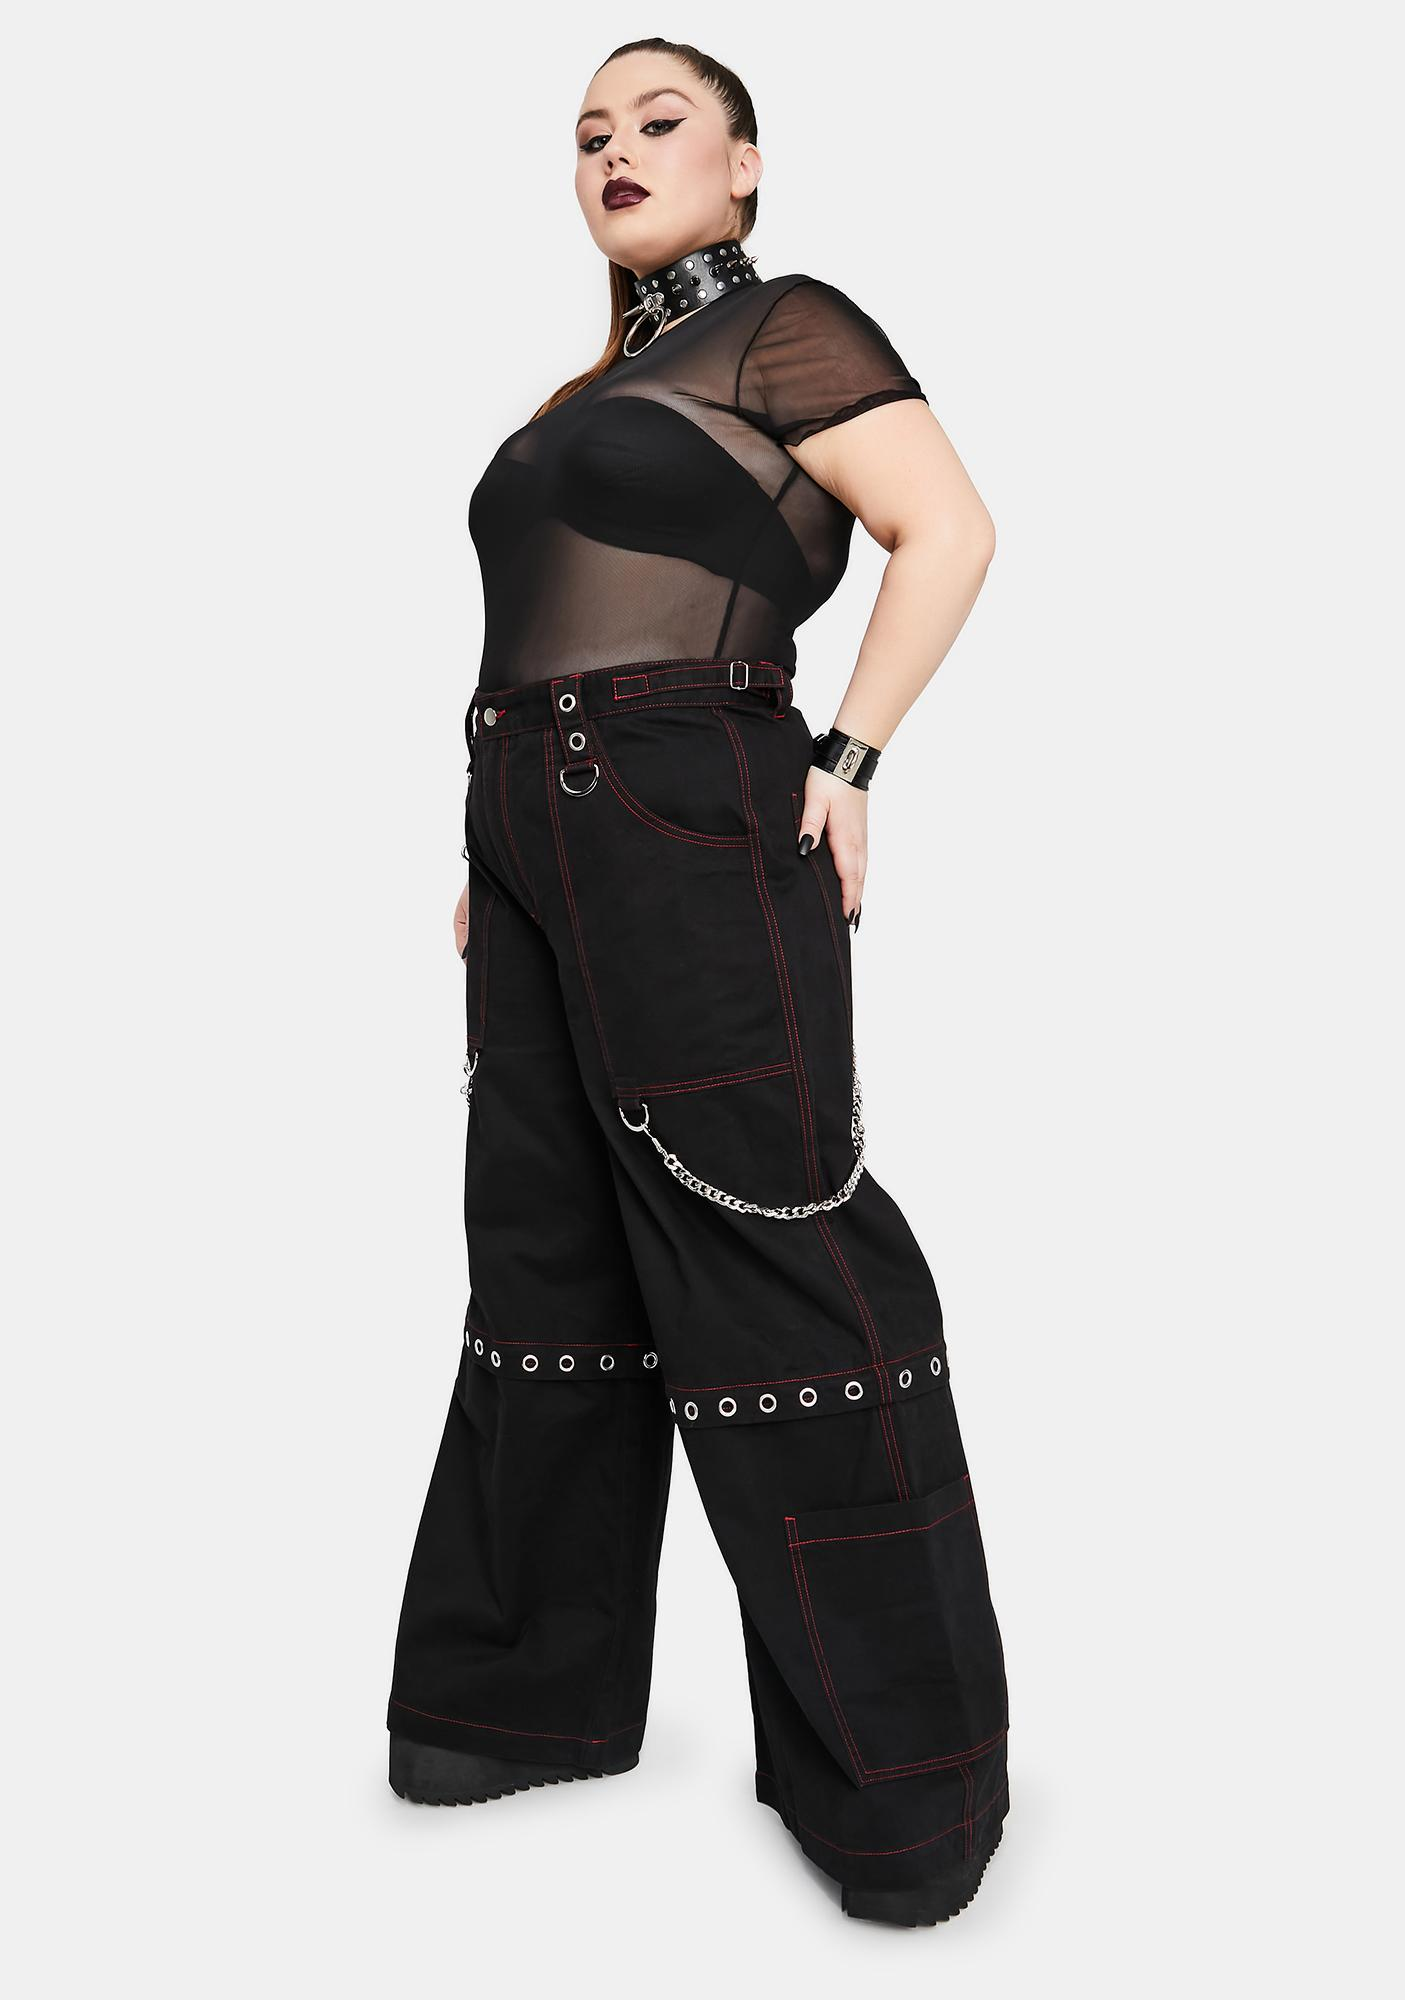 Widow Her Power Of Evil Convertible Wide Leg Pants